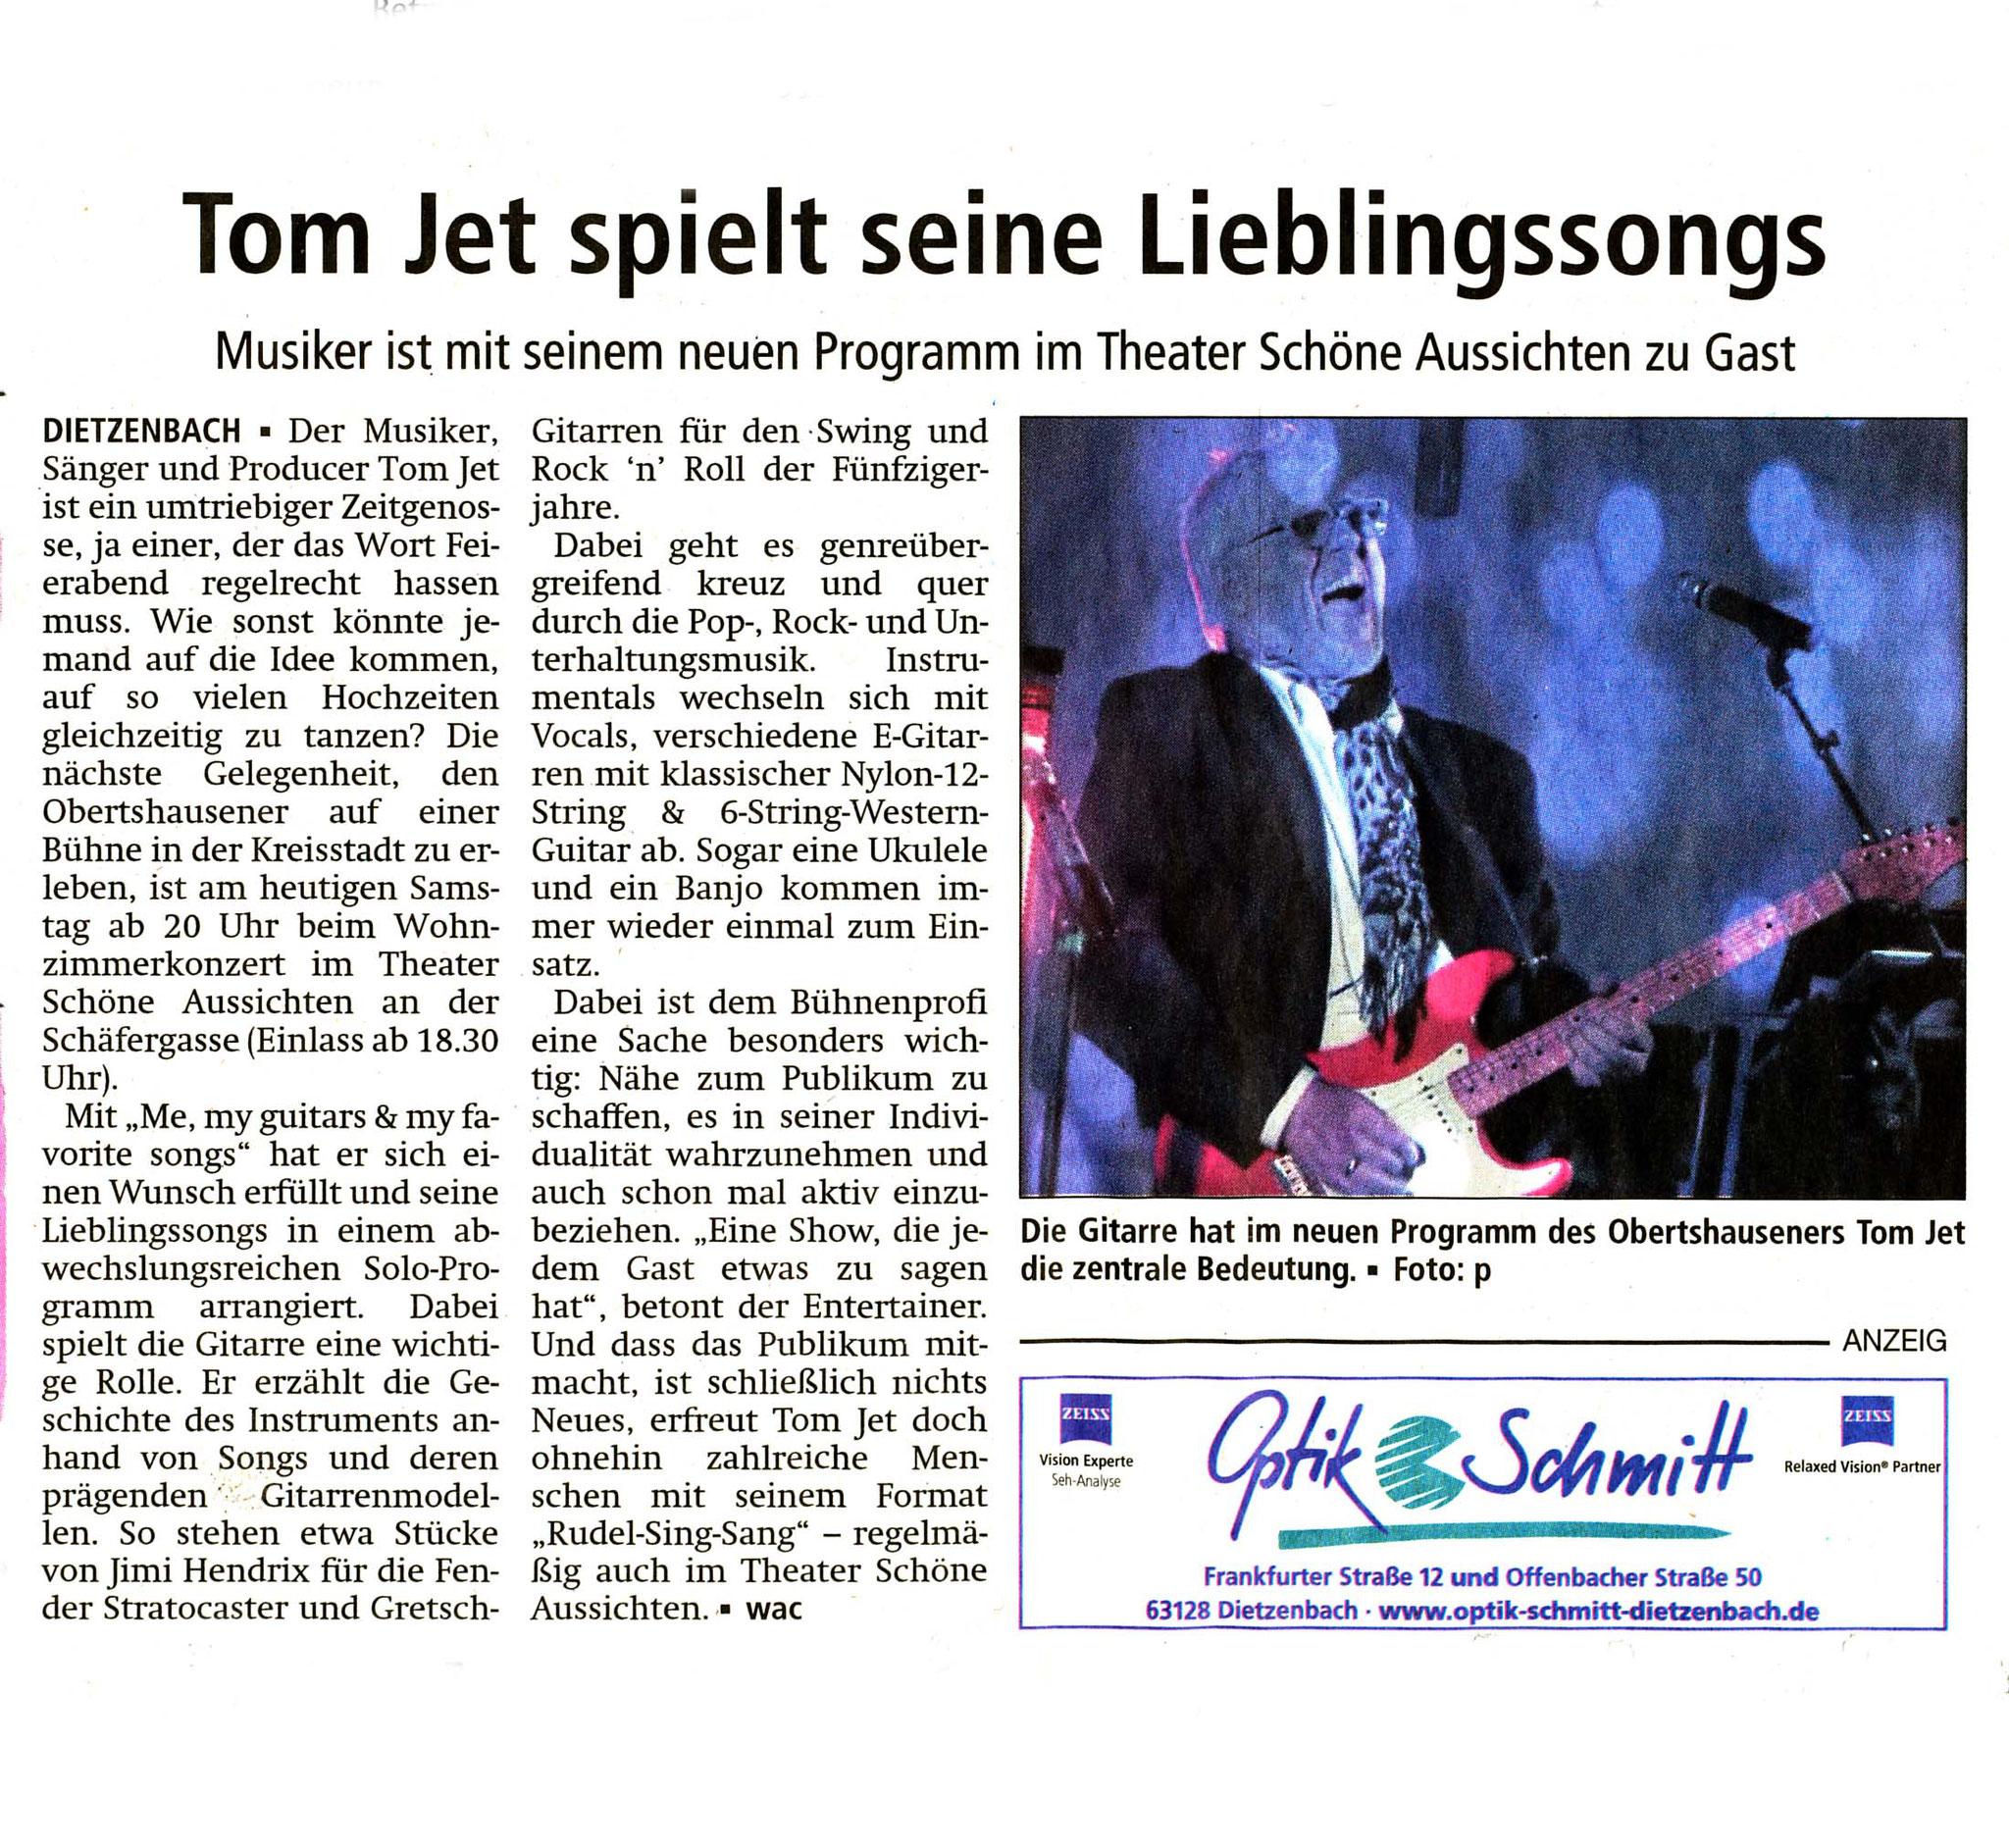 Offenbach Post, 13. Januar 2018